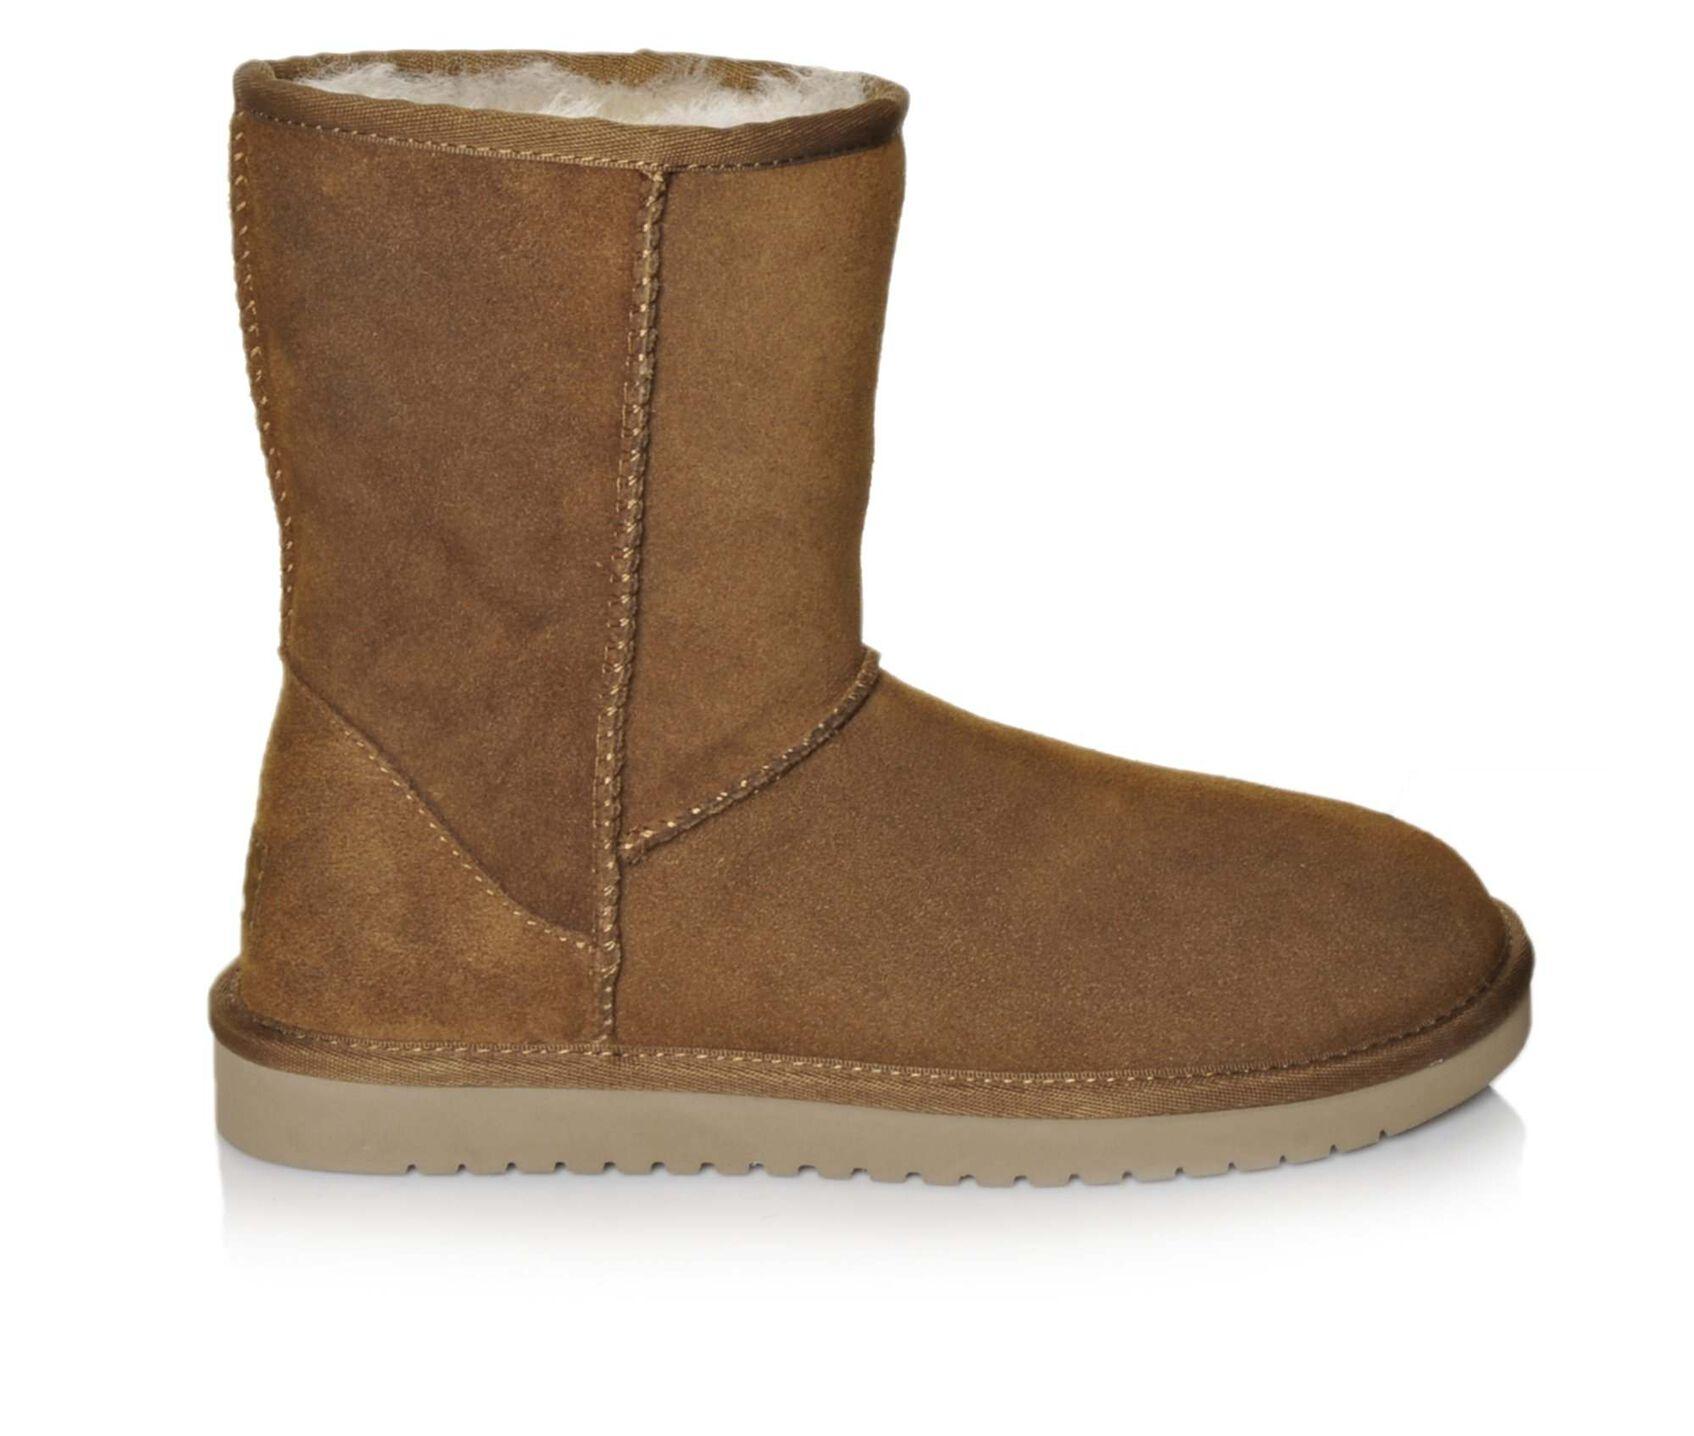 a6507e18839 Women's Koolaburra by UGG Classic Short Boots